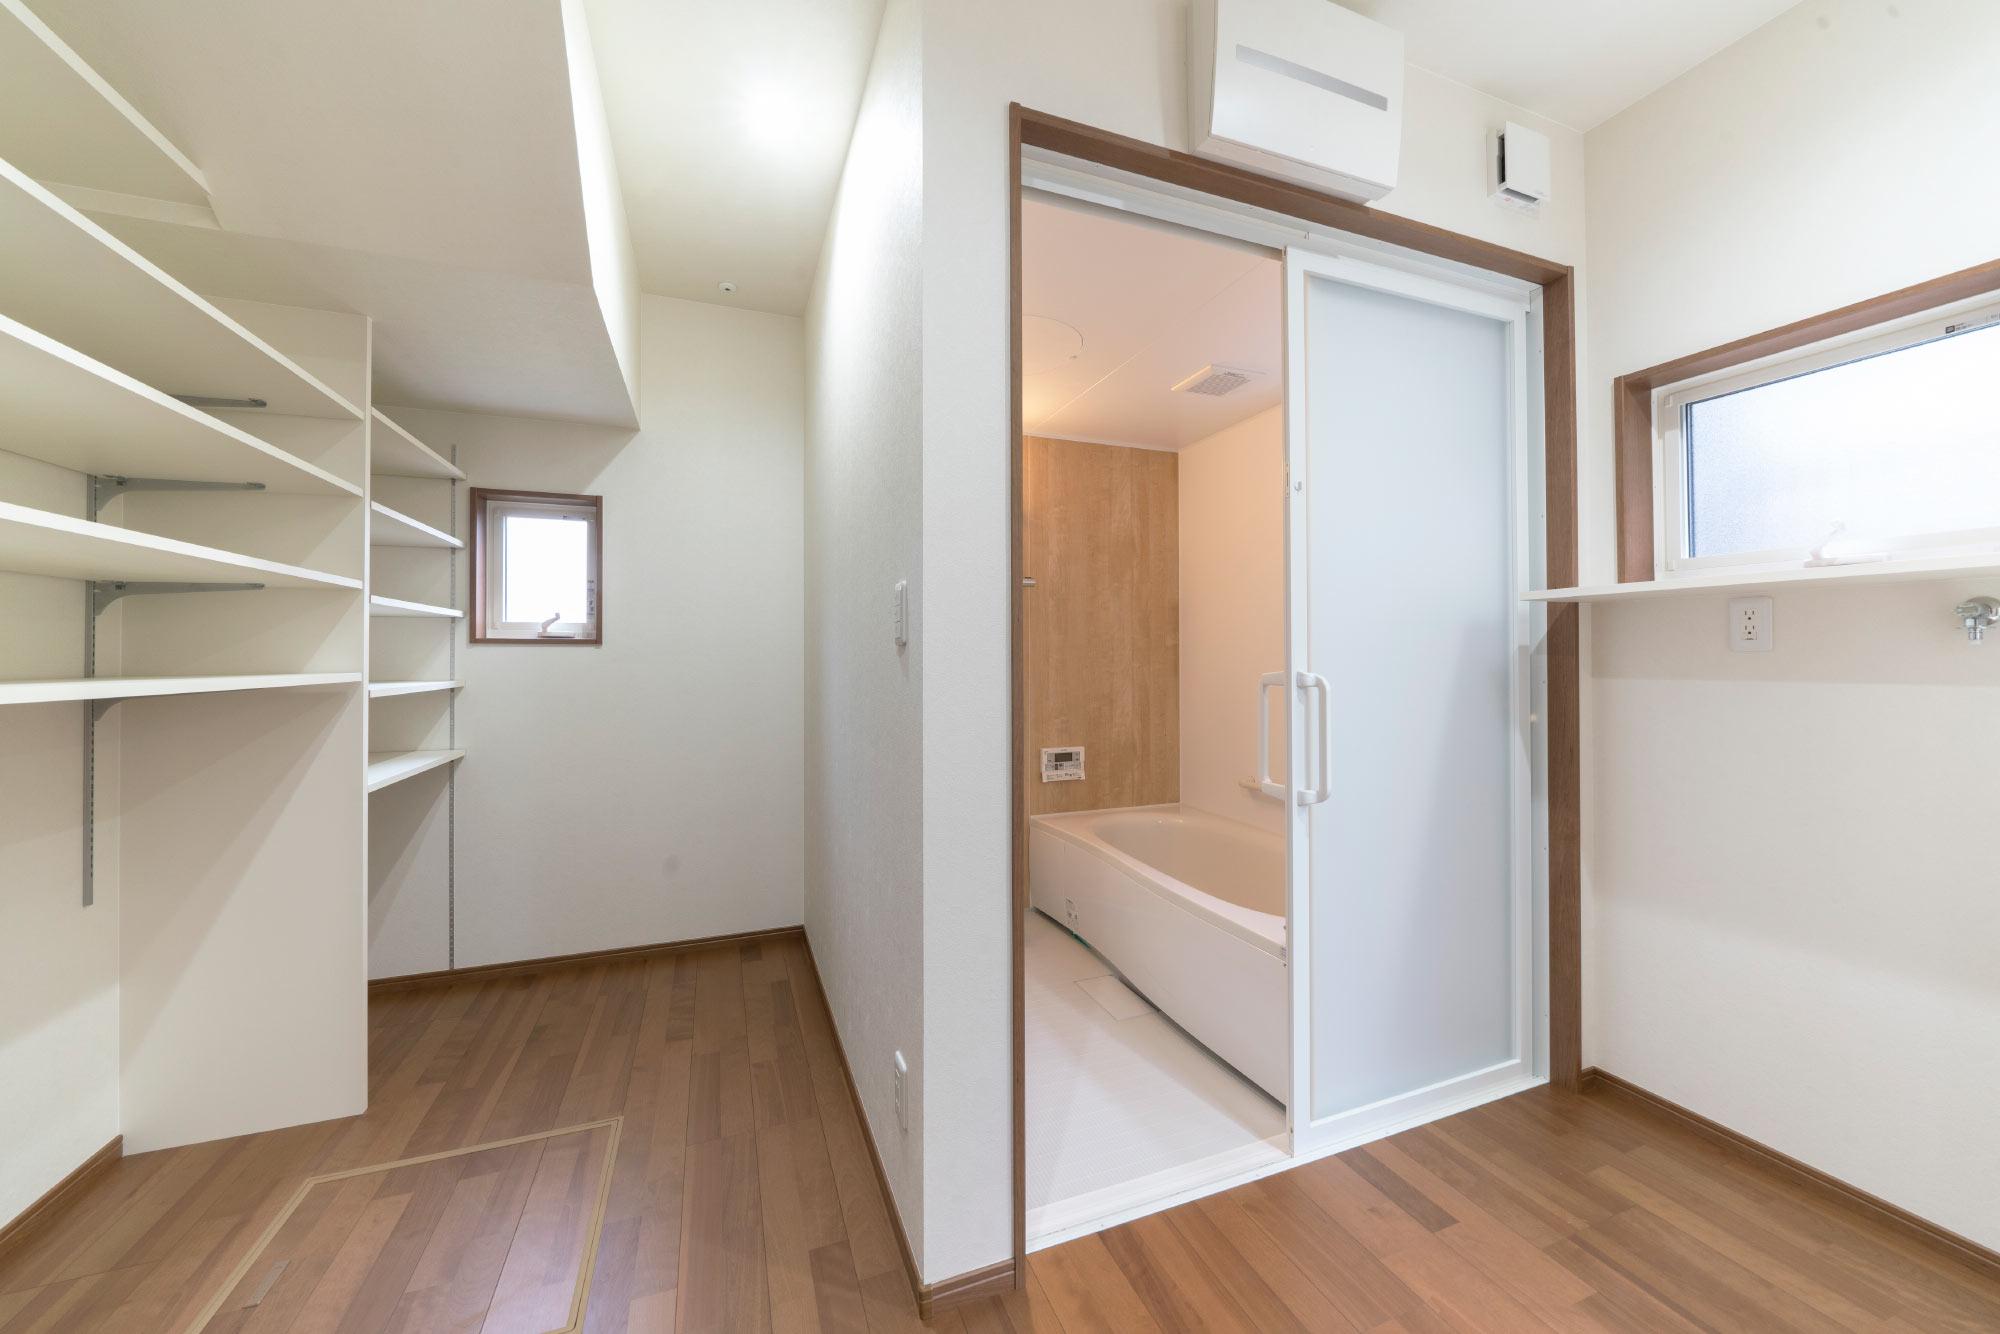 洗面脱衣室と収納